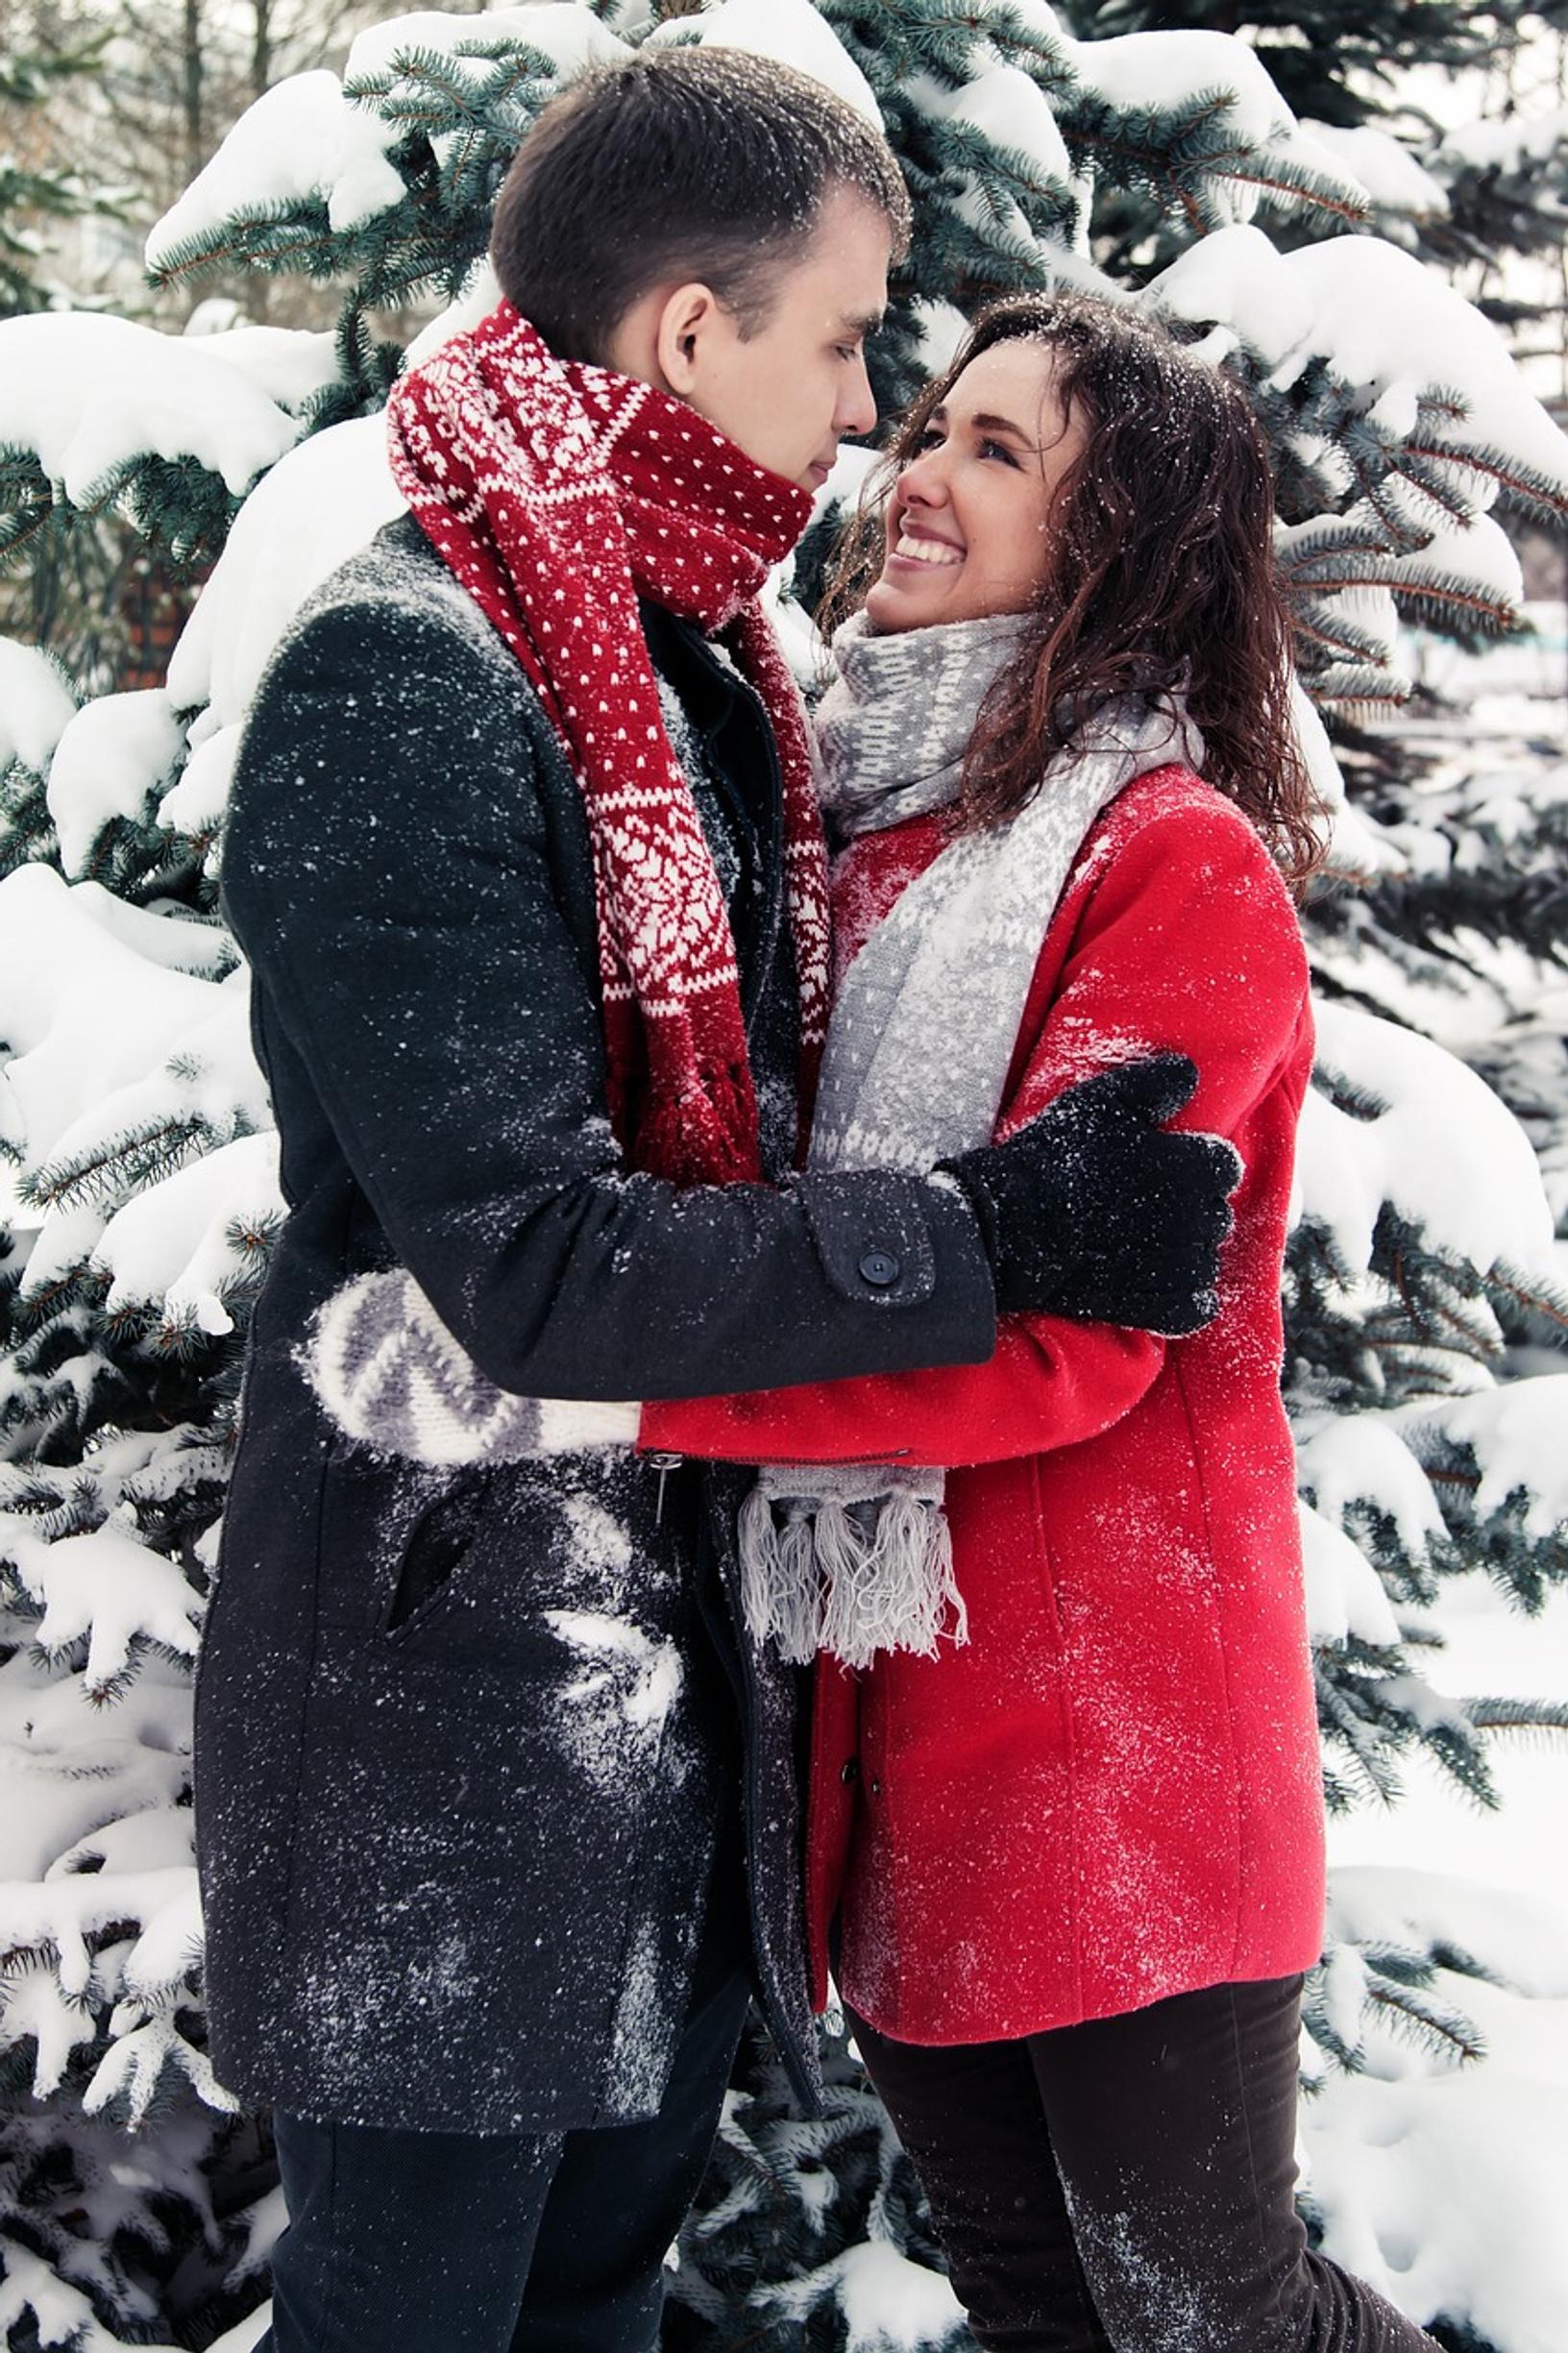 katolinen dating site Kanada